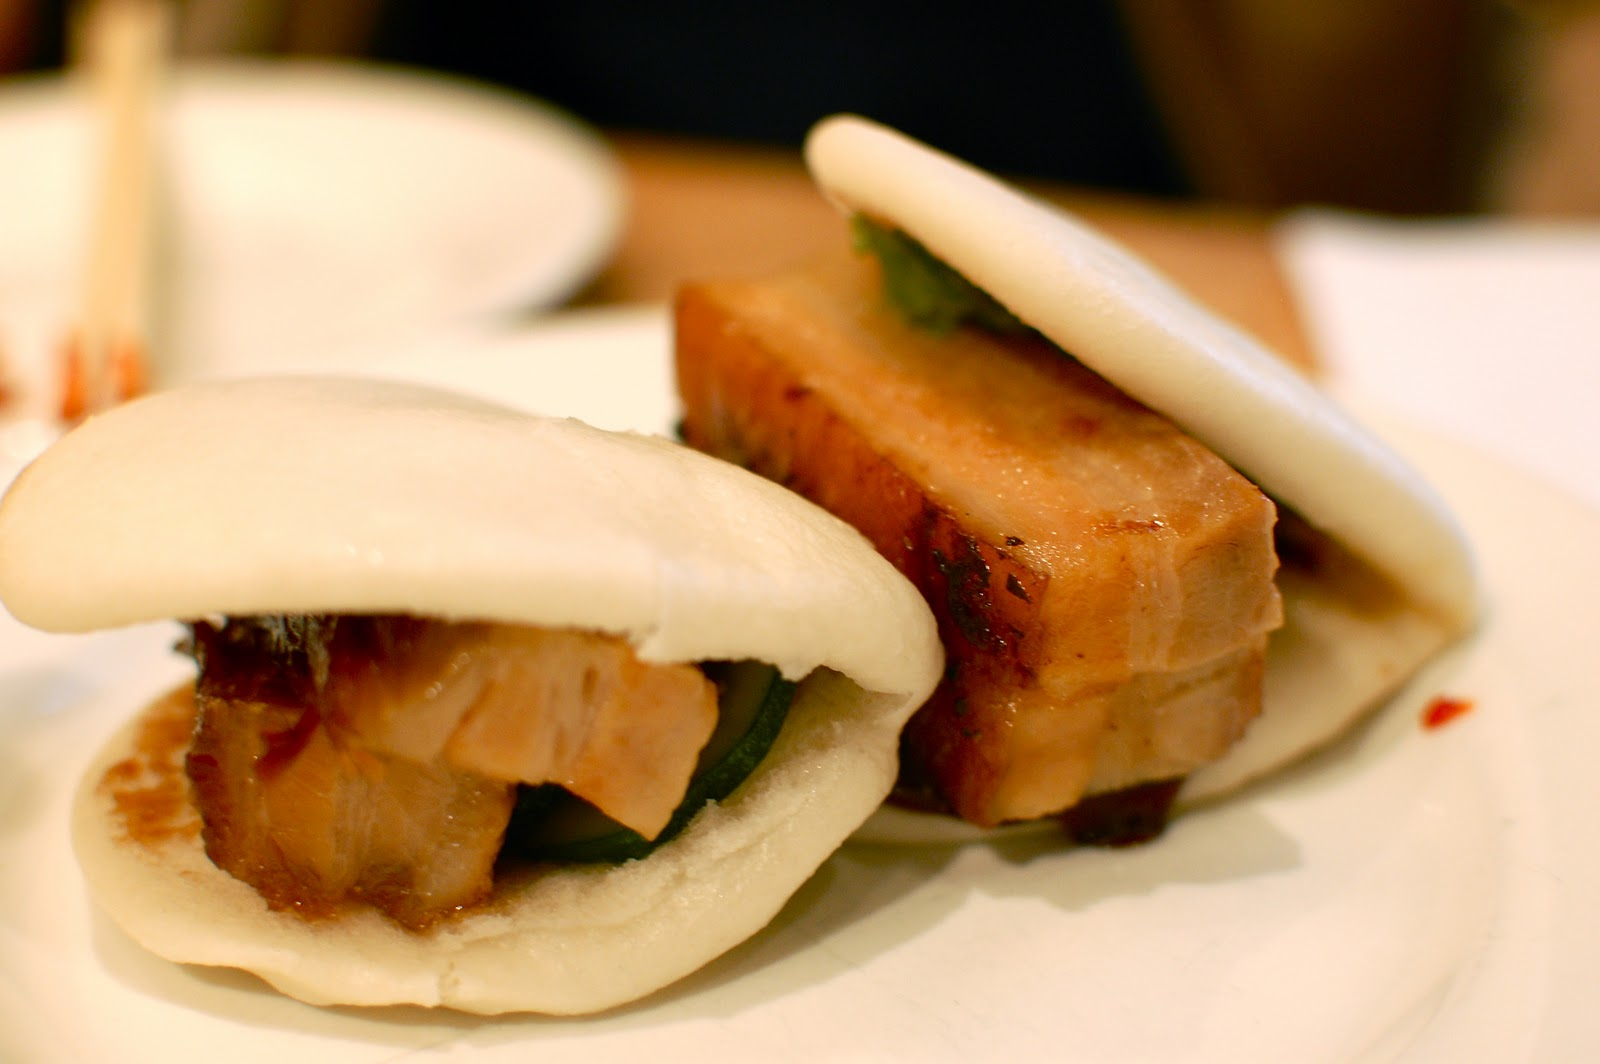 MY HOTEL LIFE: Momofuku: Pork Bun Heaven?